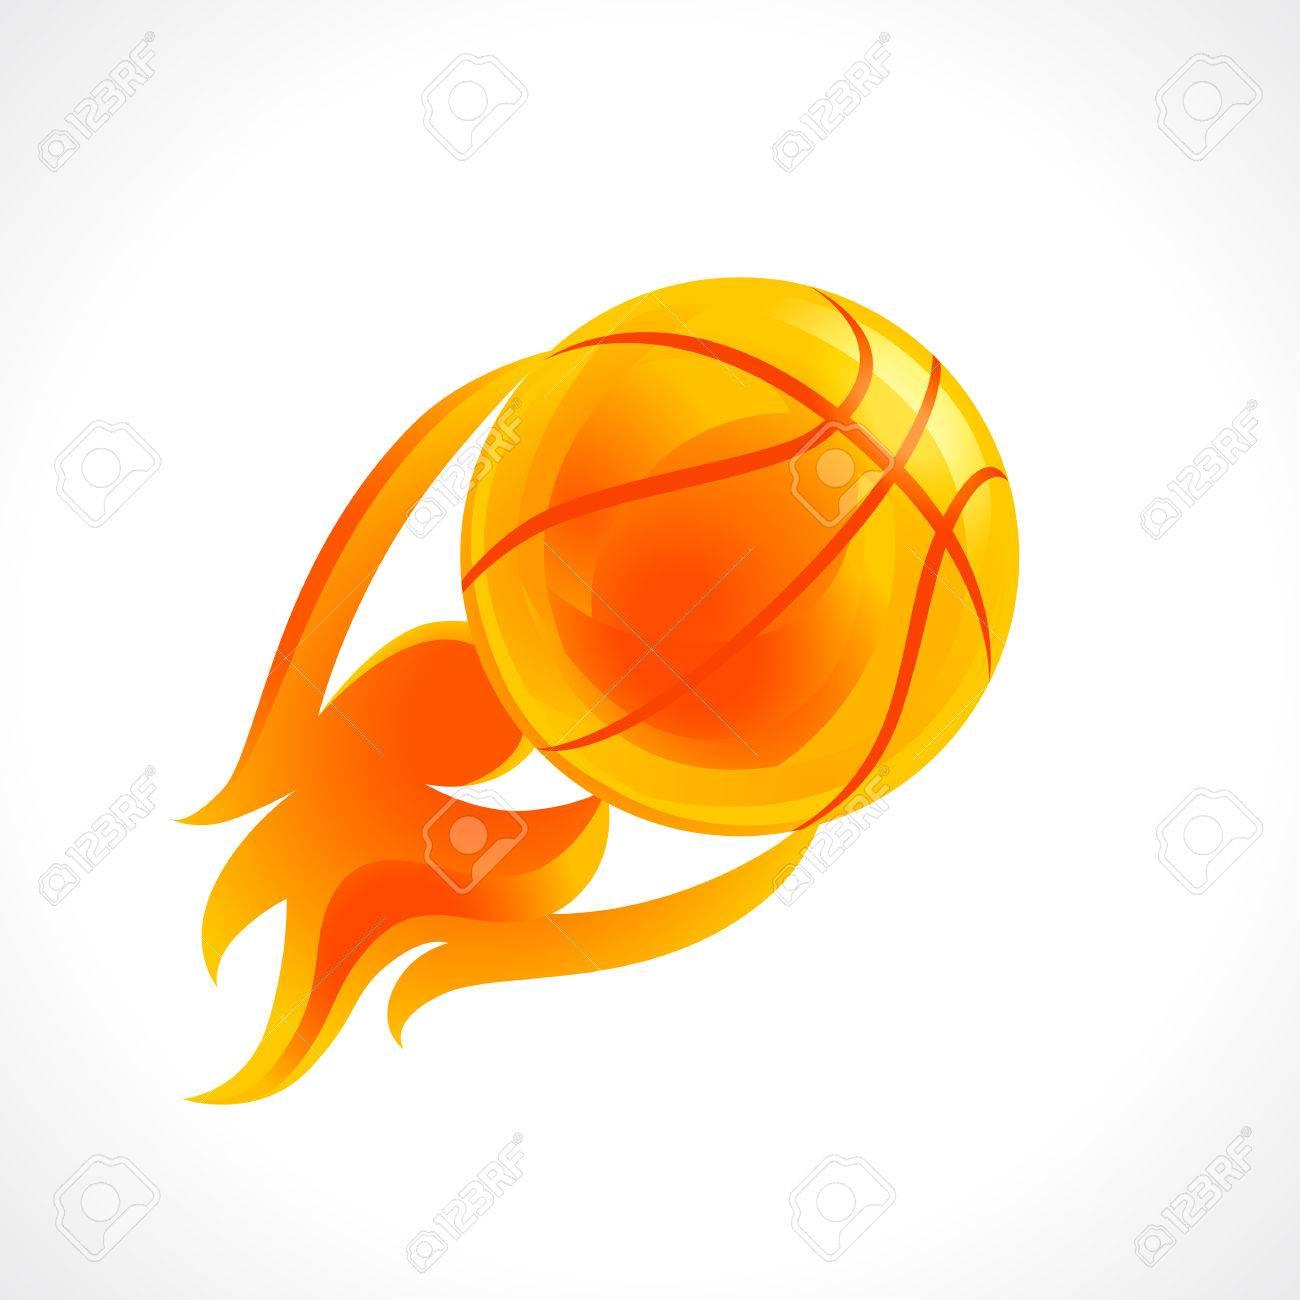 fc746356f9ba0 Basketball flame logo. Ball with fire sport team sign.